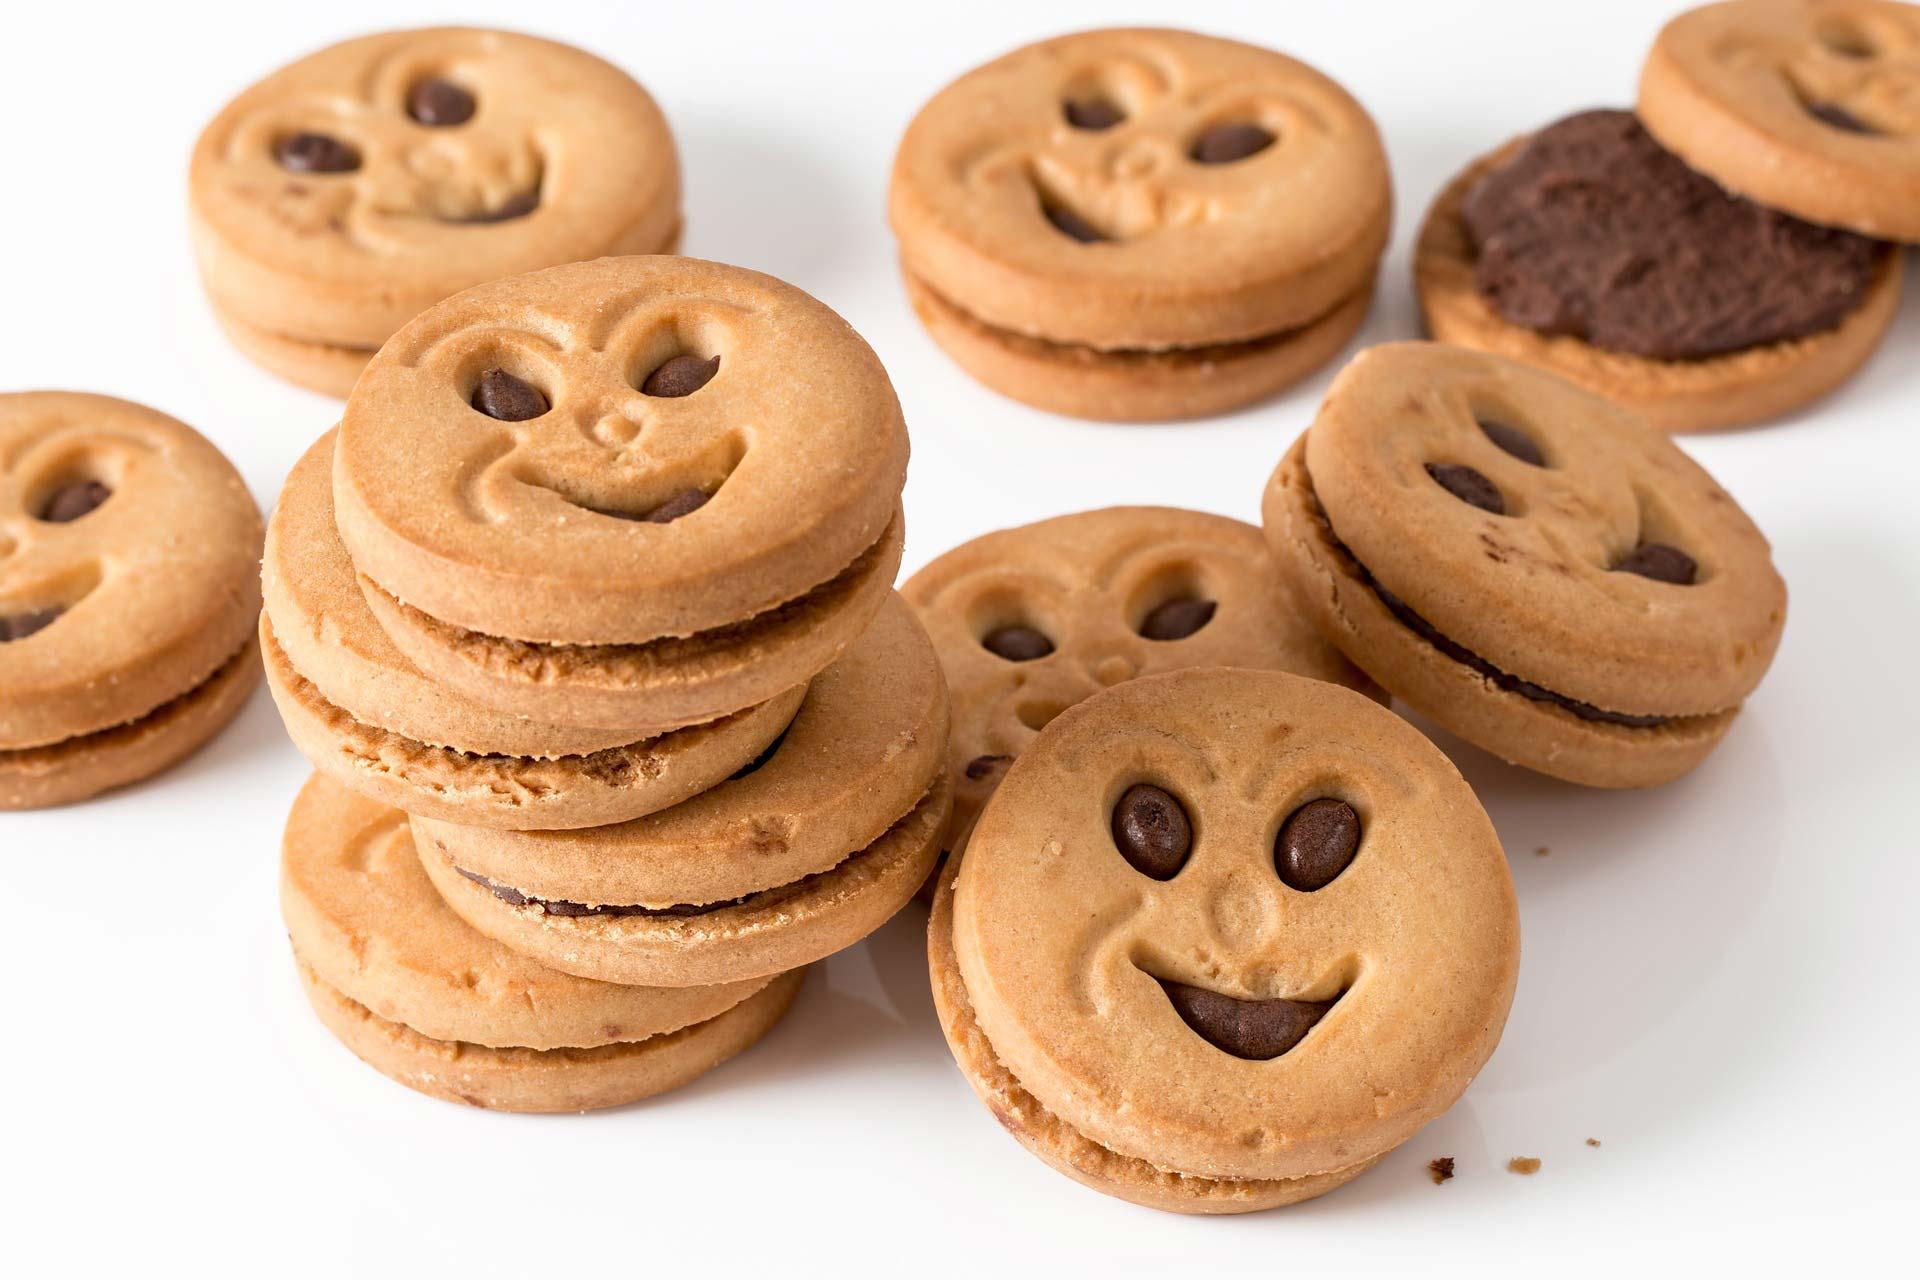 cookie-smiling-hero-wht-bkgrnd